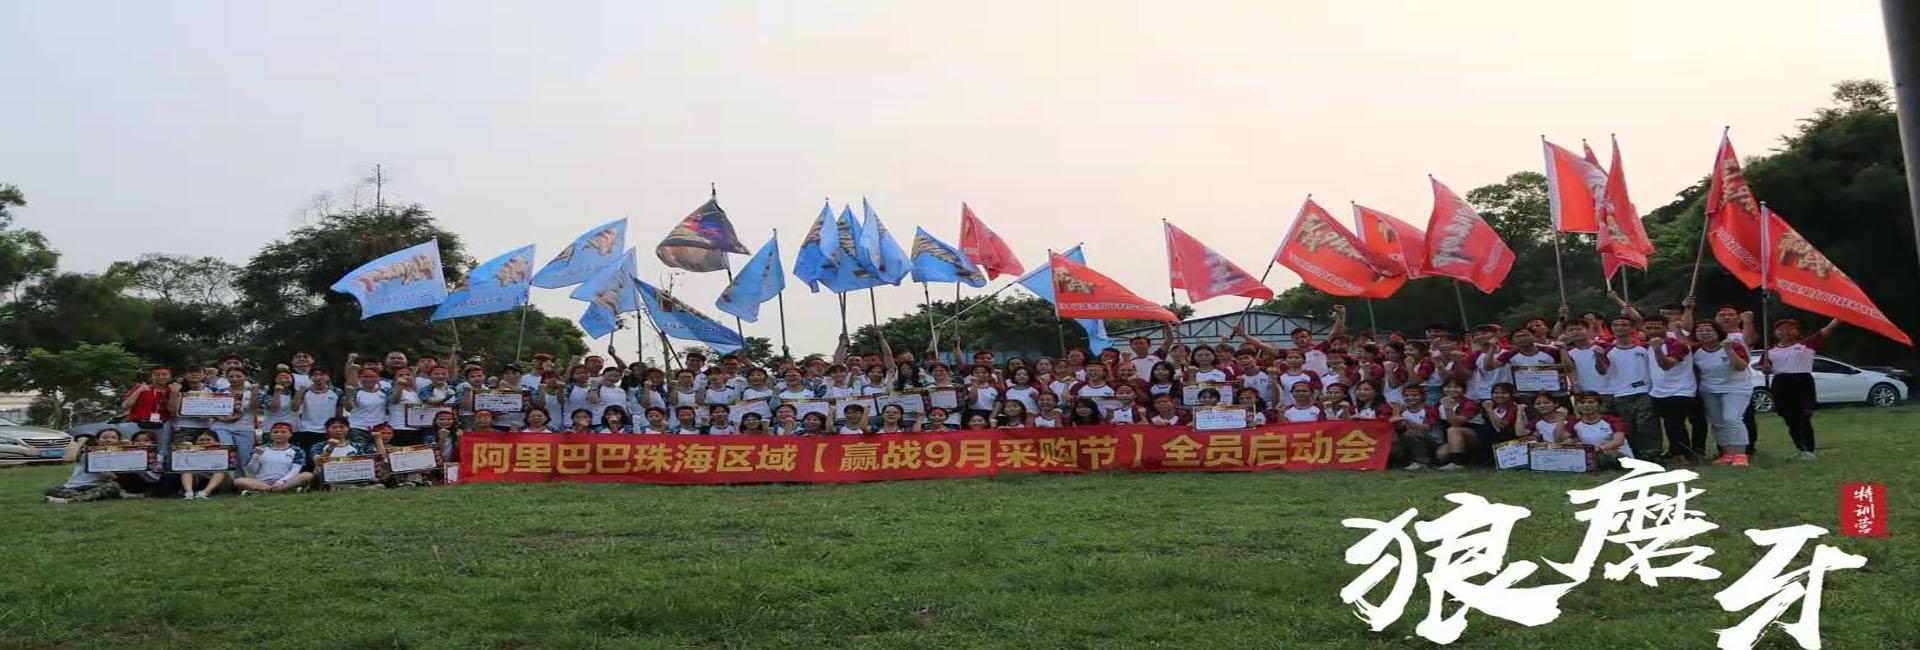 Zhuhai Trynow Baba Technology Co.,Ltd